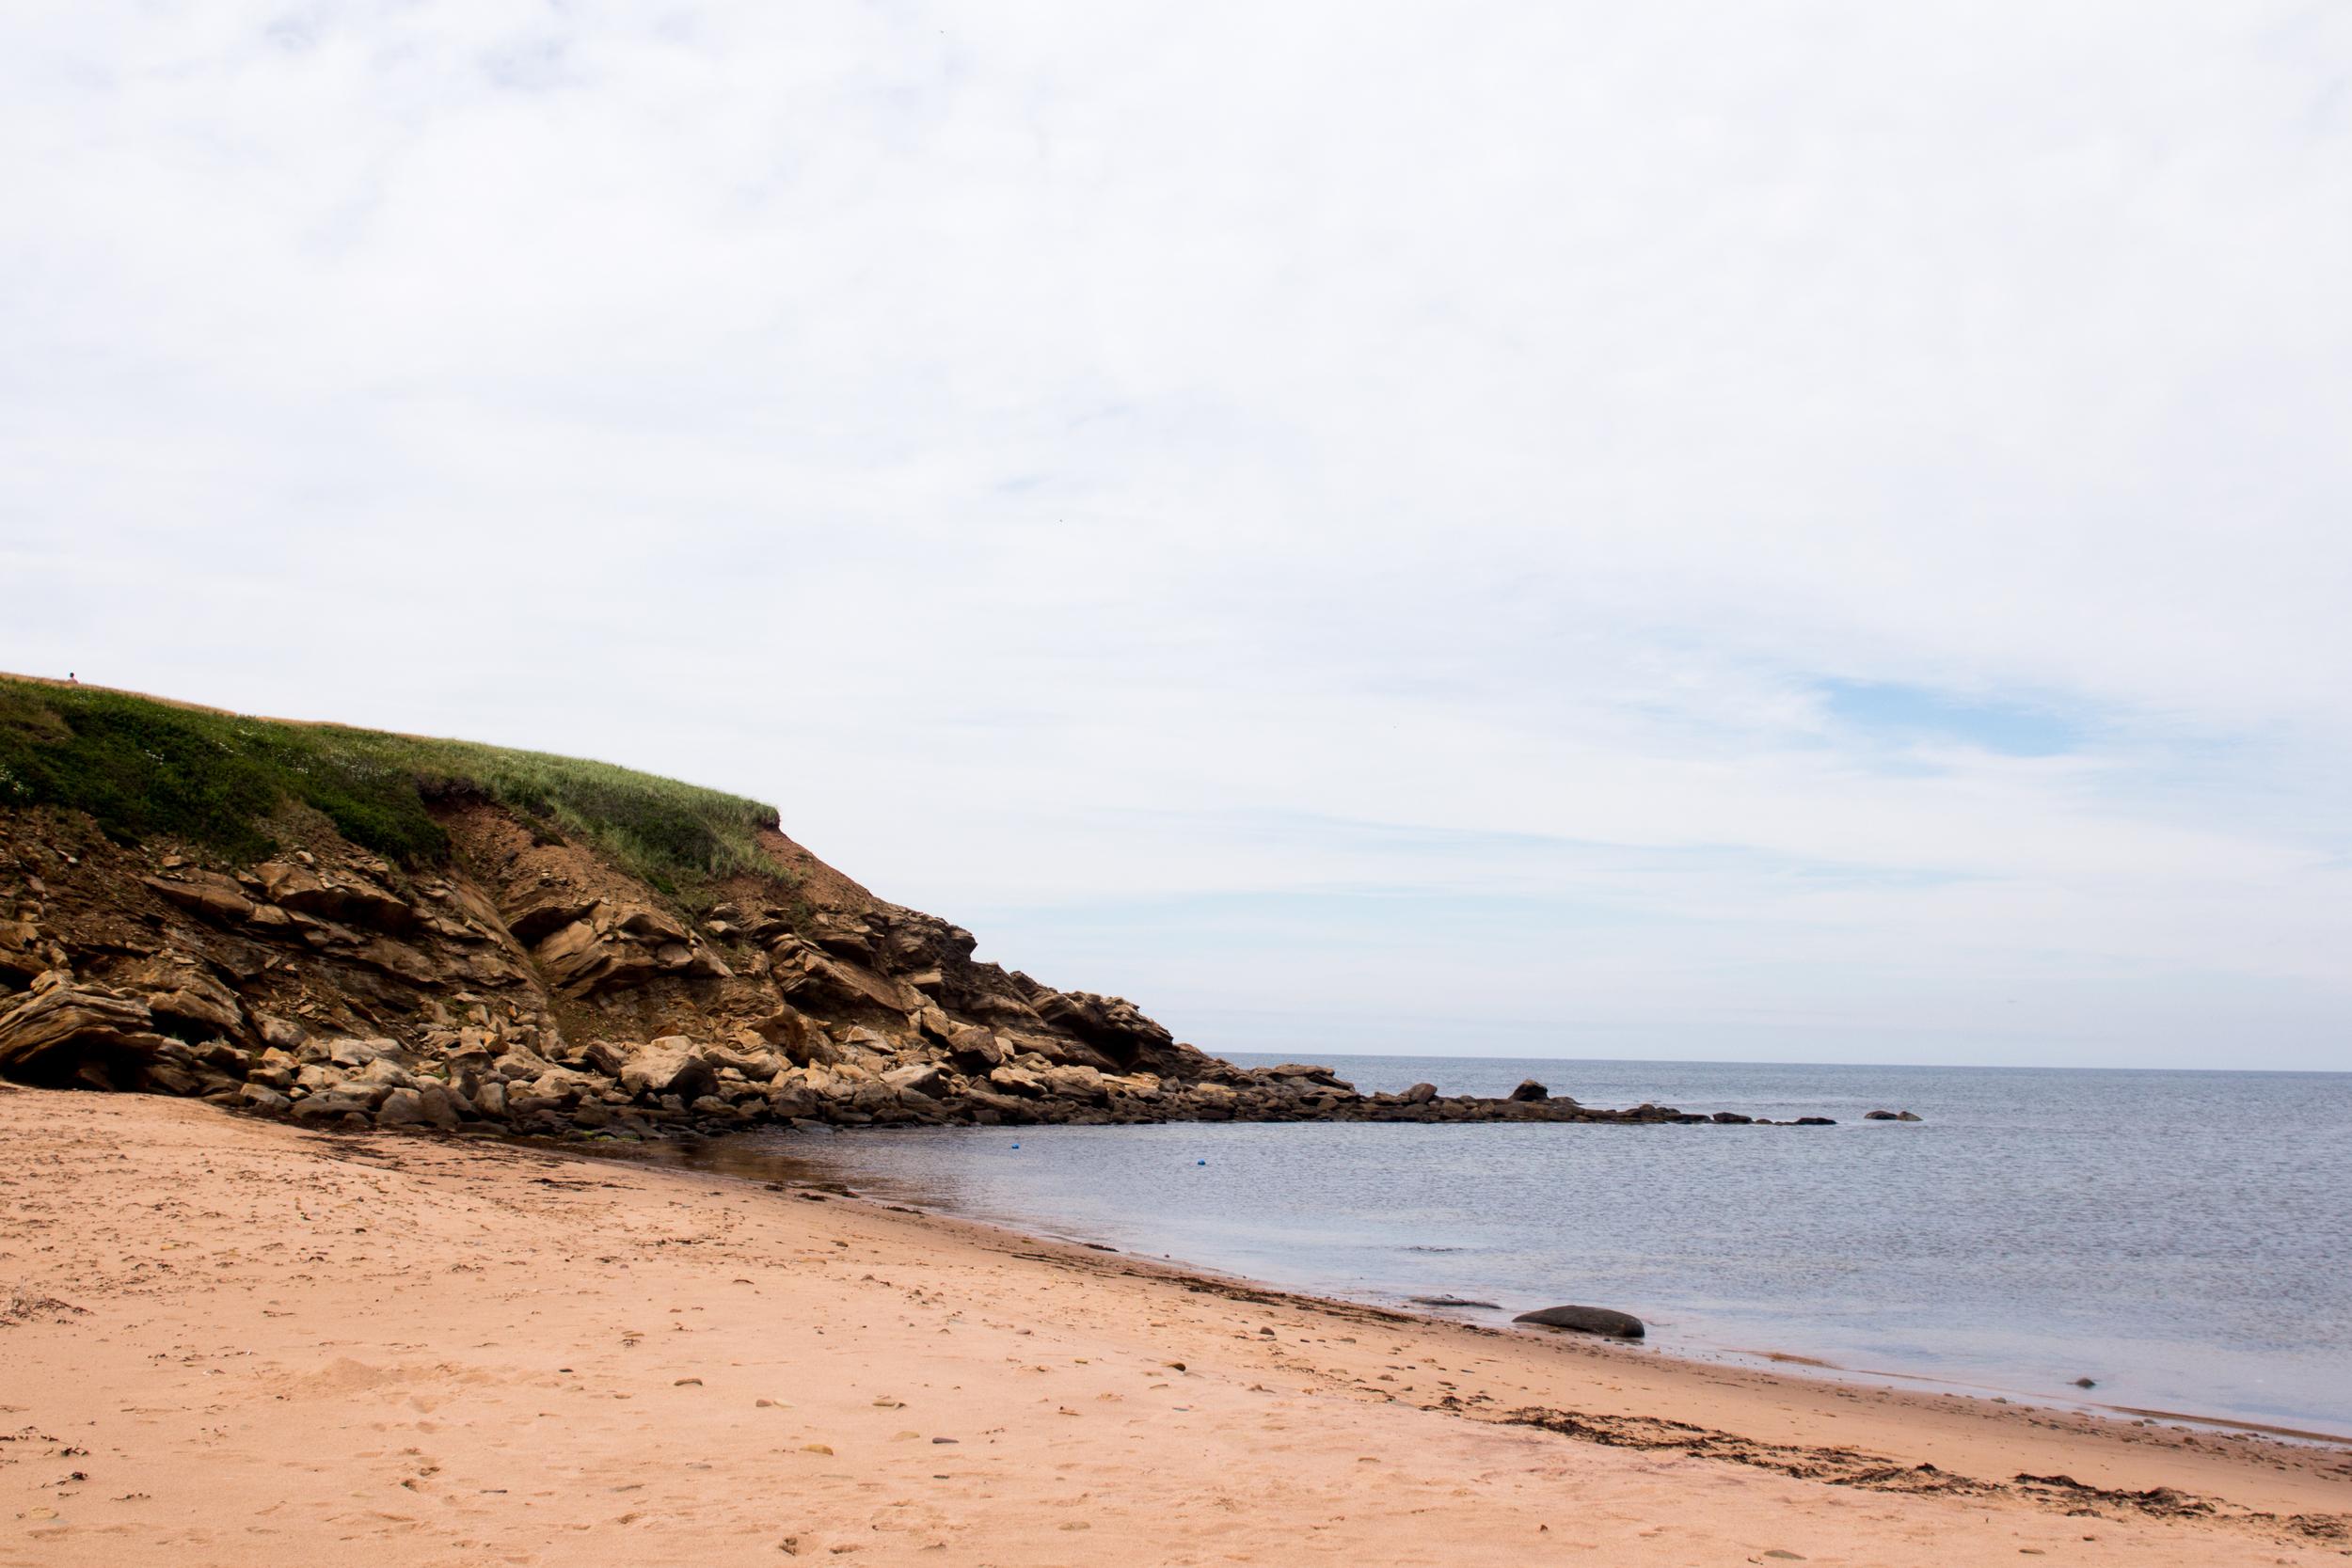 Beach on Cape Breton Island.